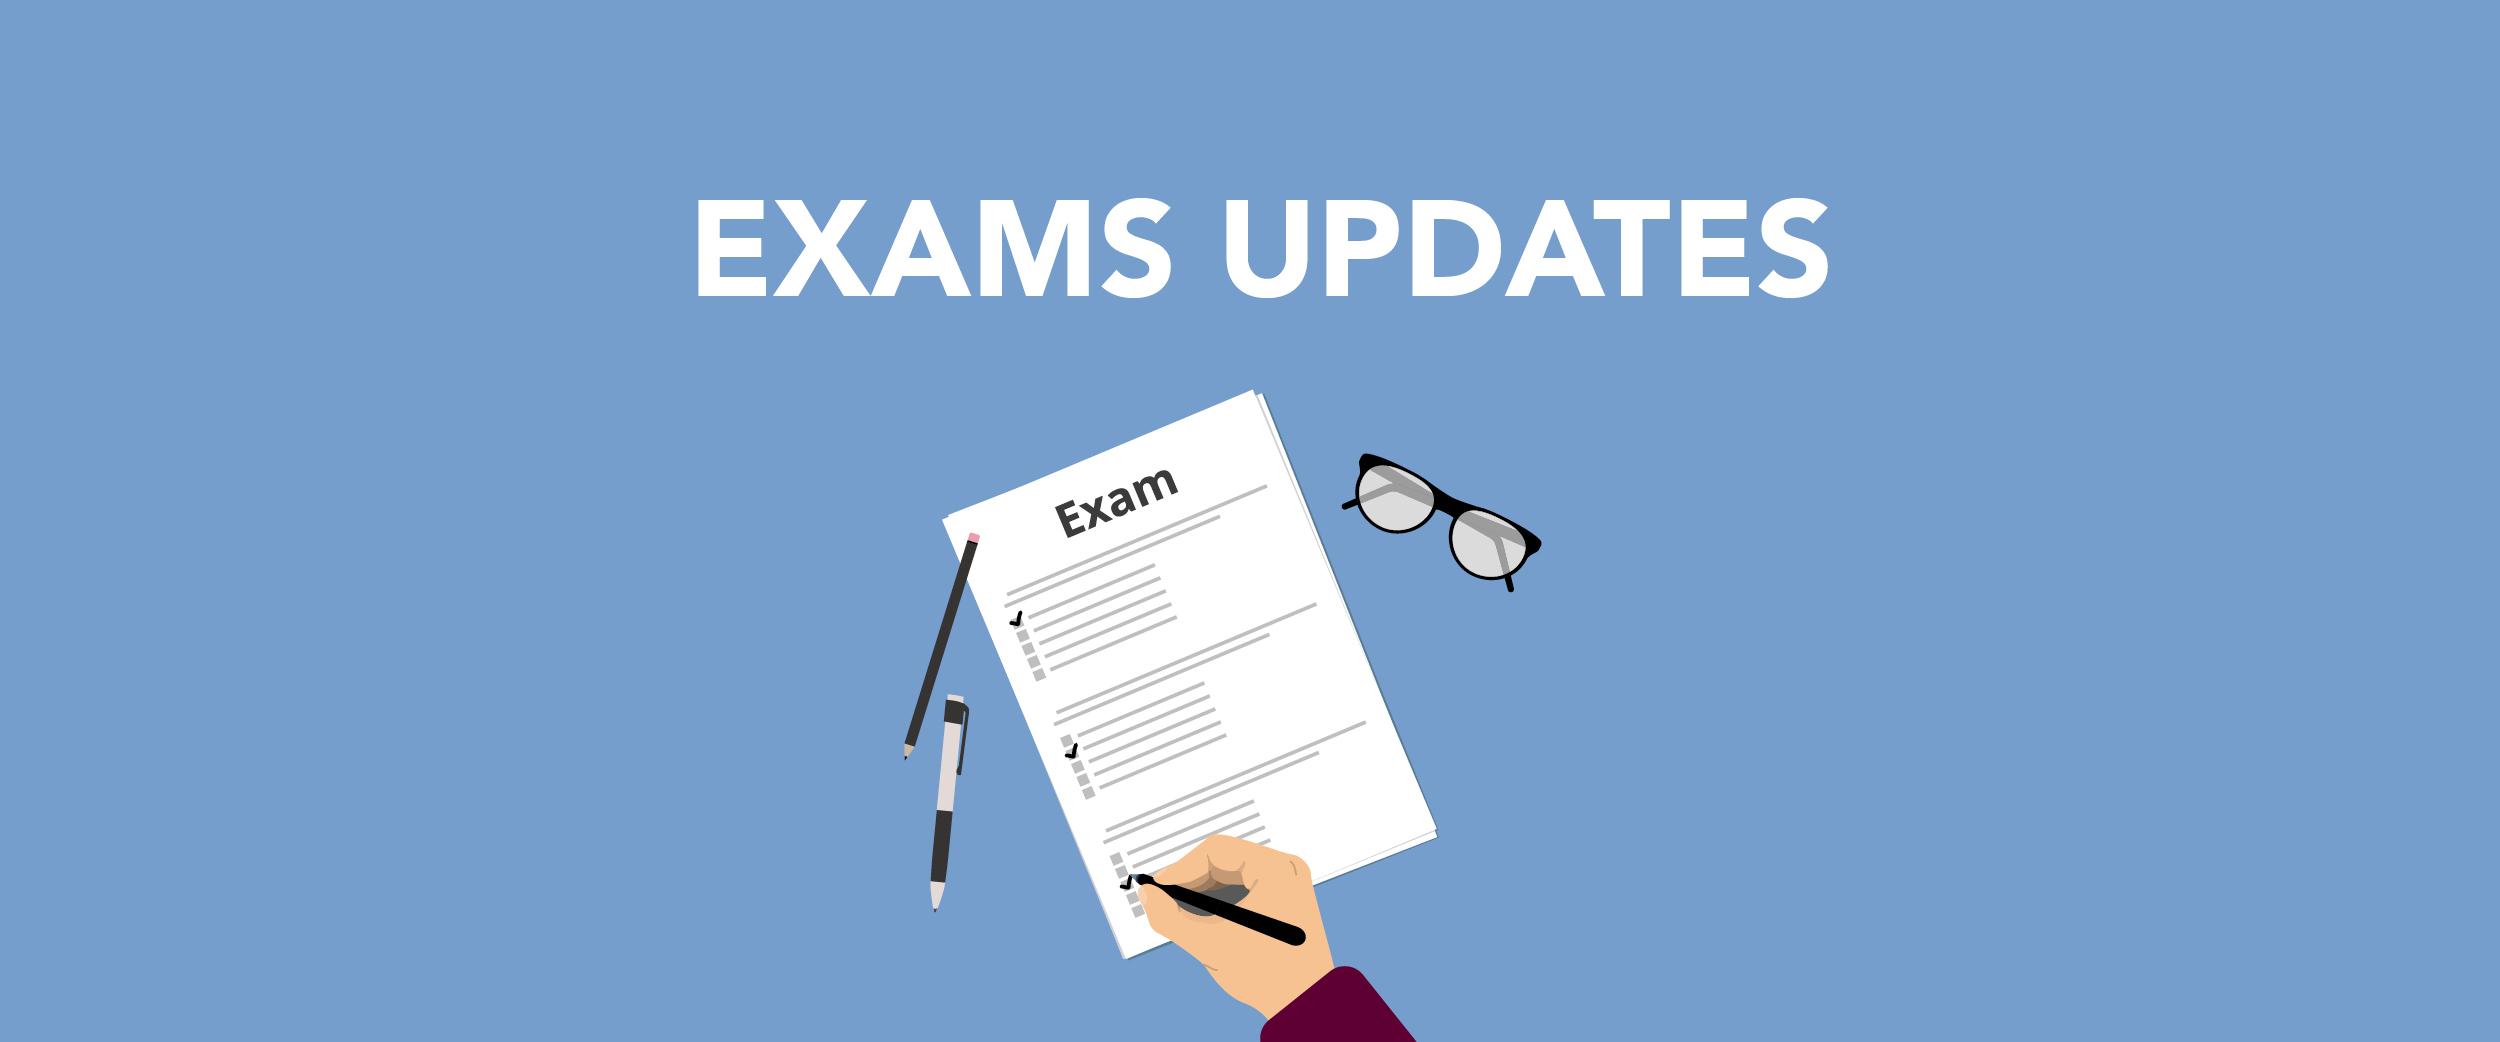 2021-01-06 Exams Update banner